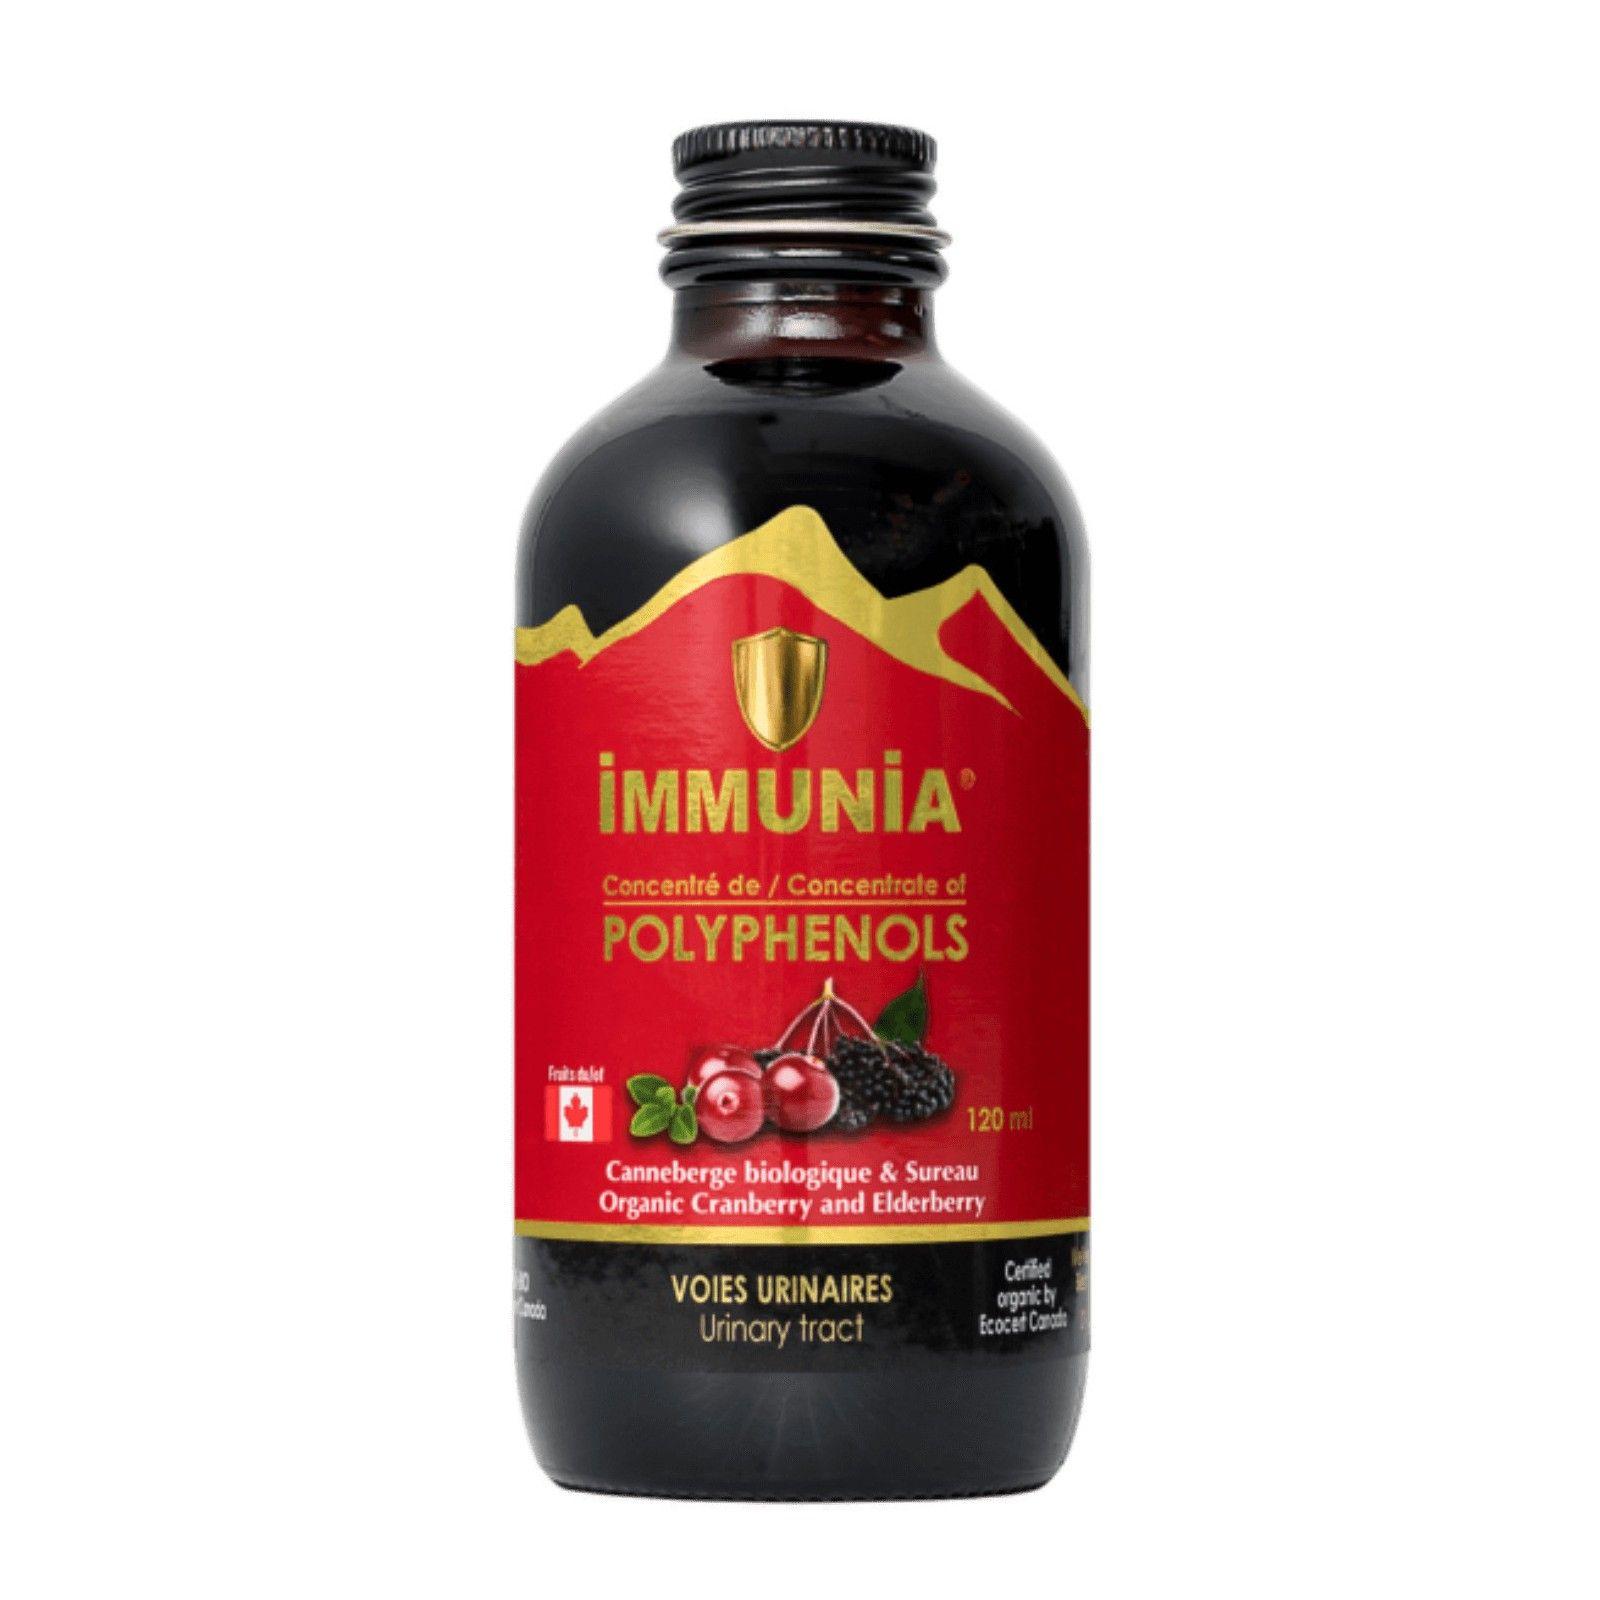 Fruitomed - IIMMUNIA VOIES URINAIRES BIO – Canneberge & Sureau